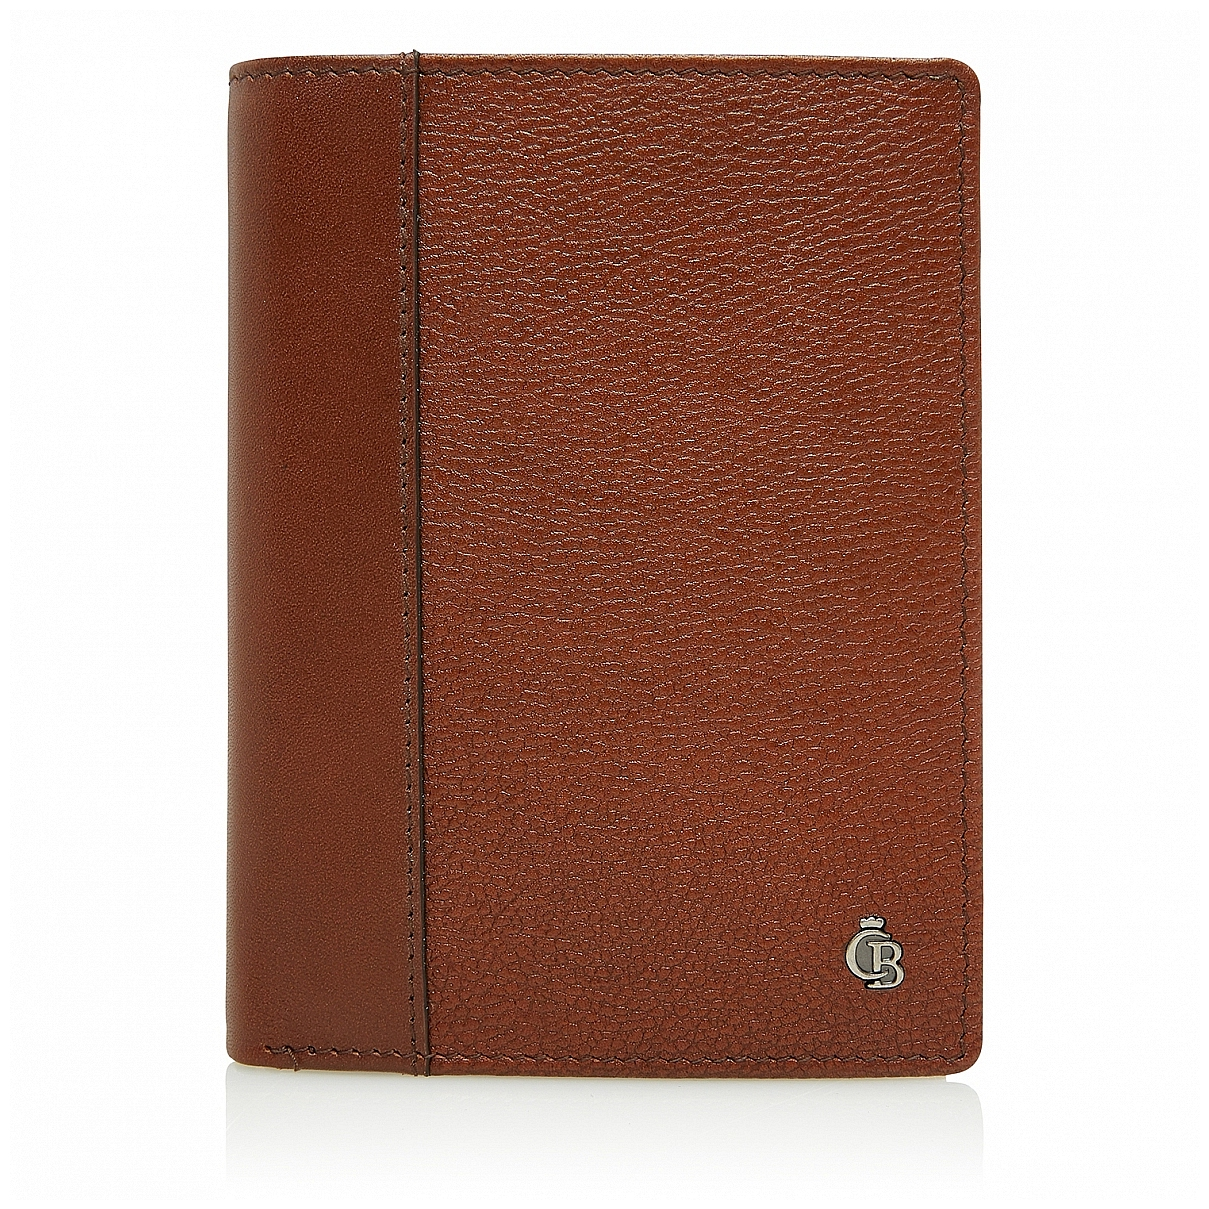 Castelijn & Beerens Pánská kožená peněženka RFID 695793 VIVO koňak